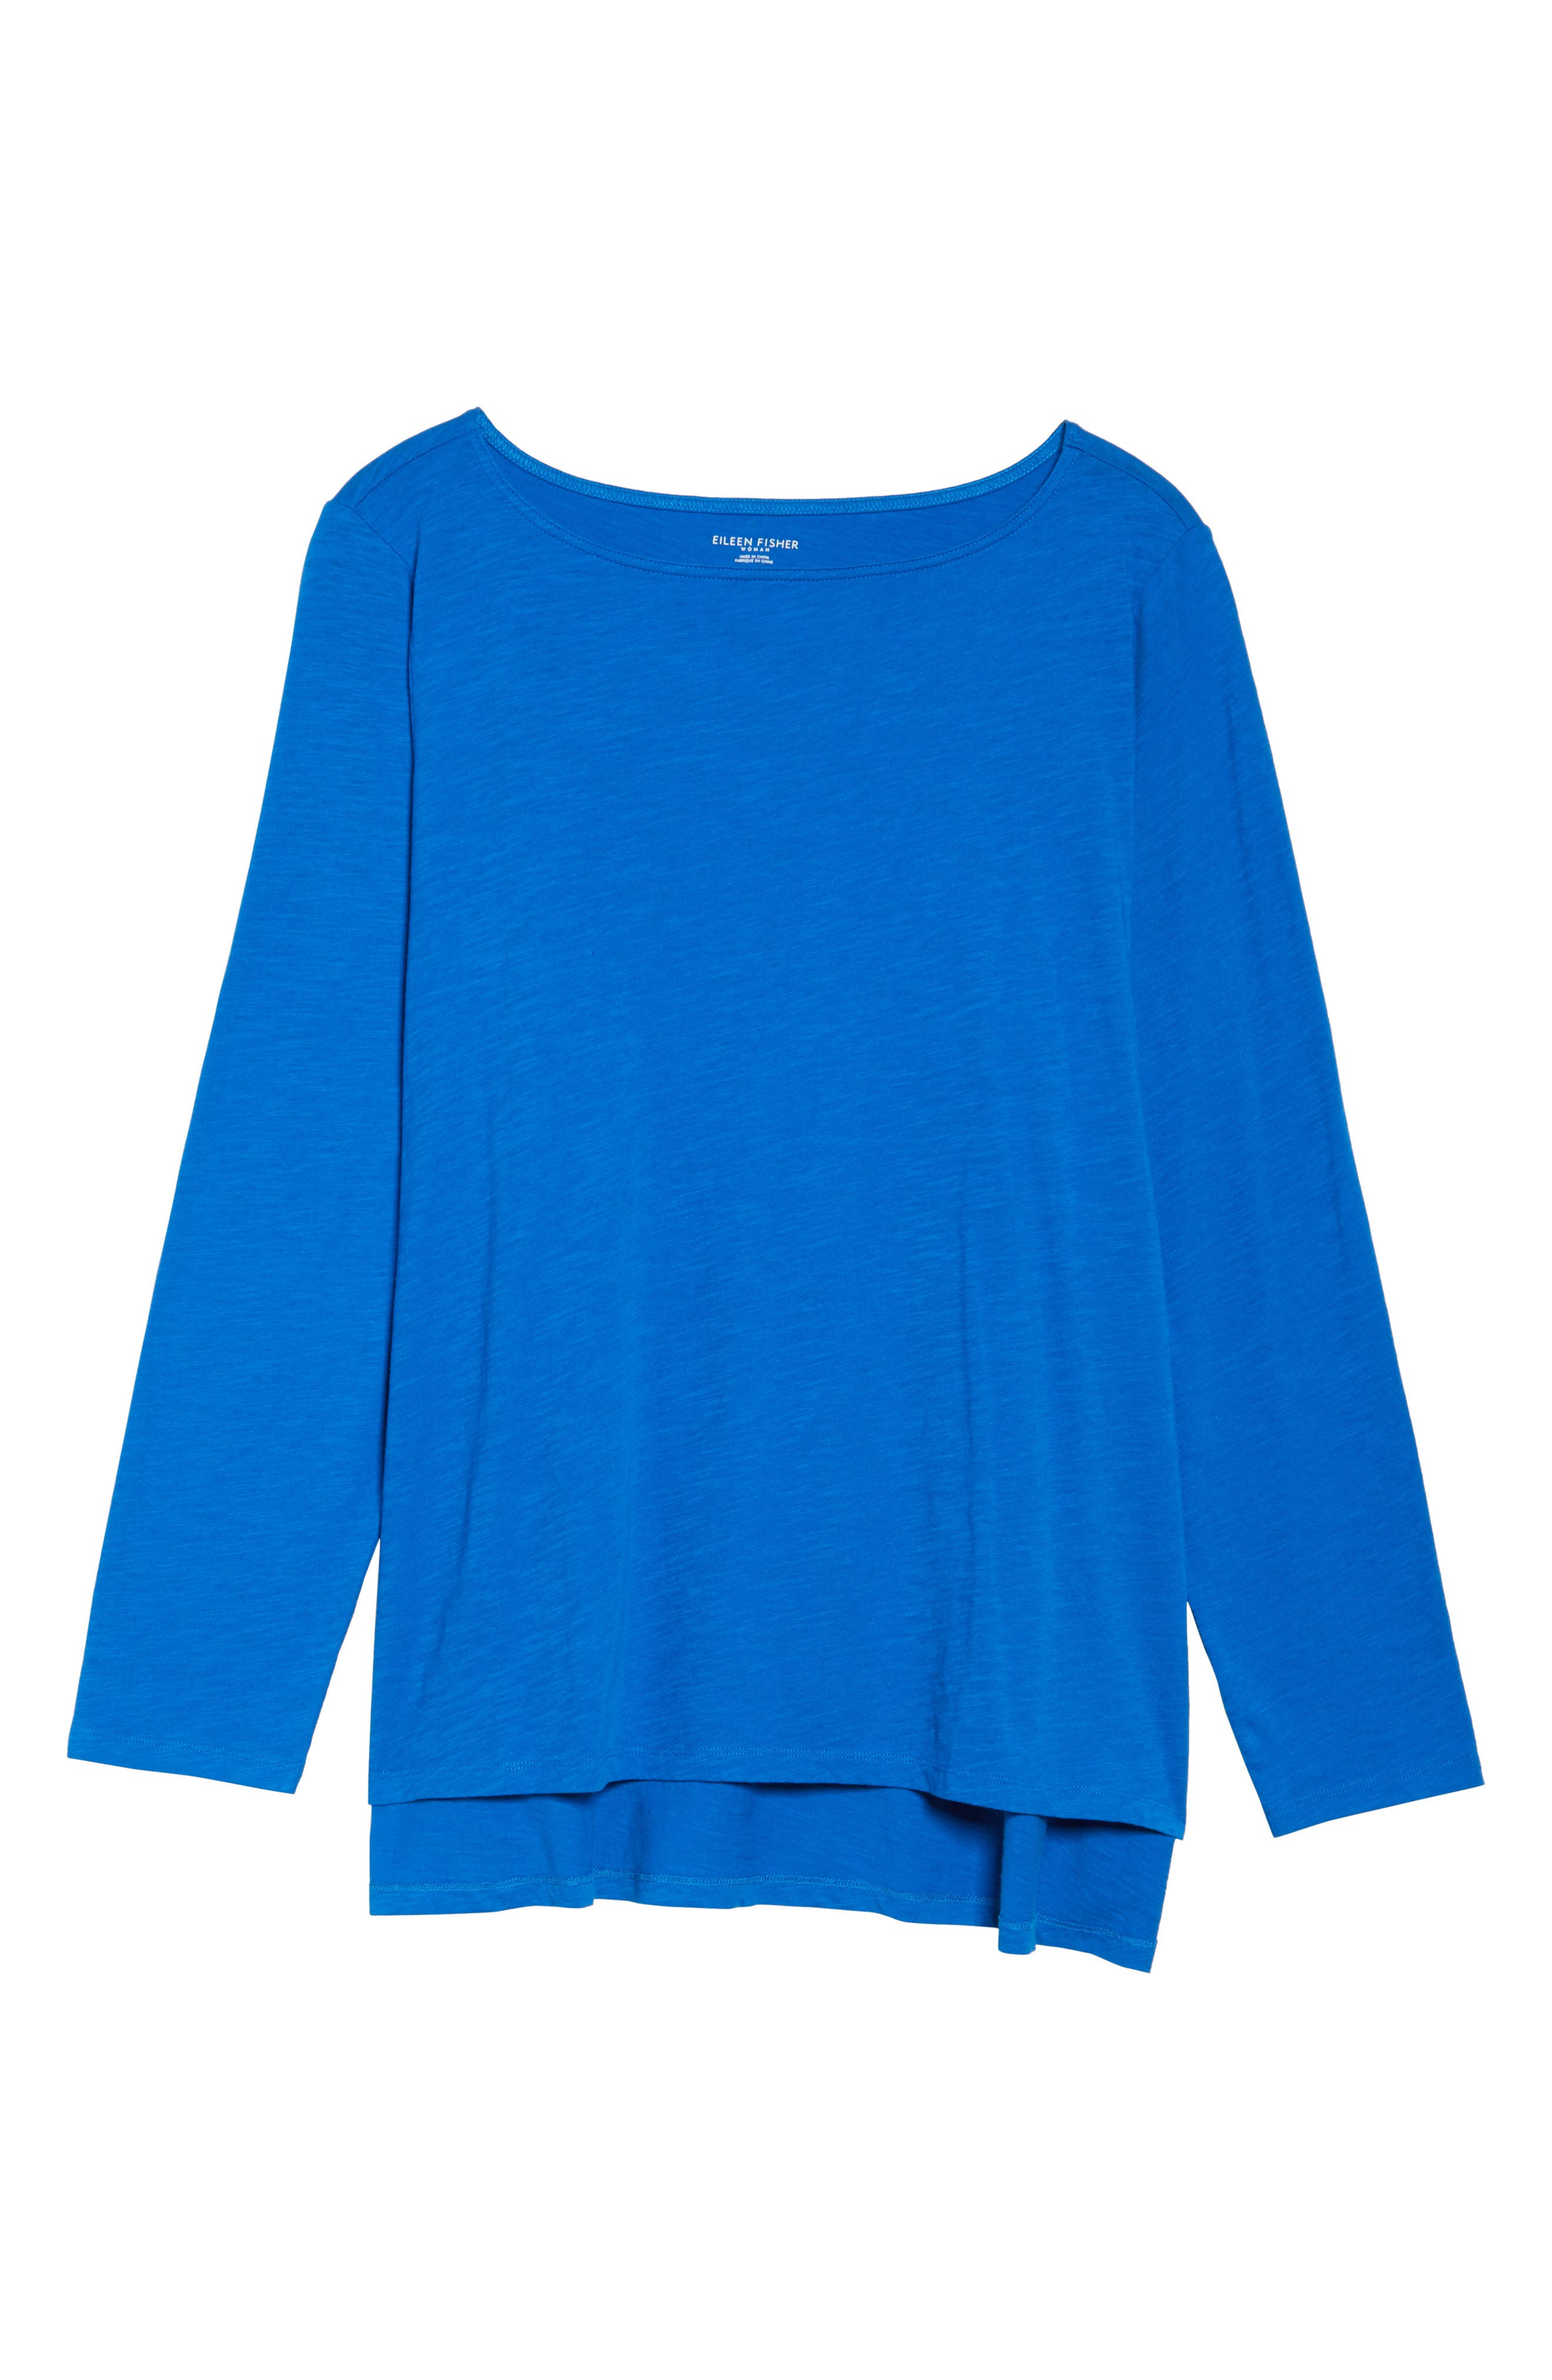 Organic Cotton Jersey Top,                             Alternate thumbnail 6, color,                             Blue